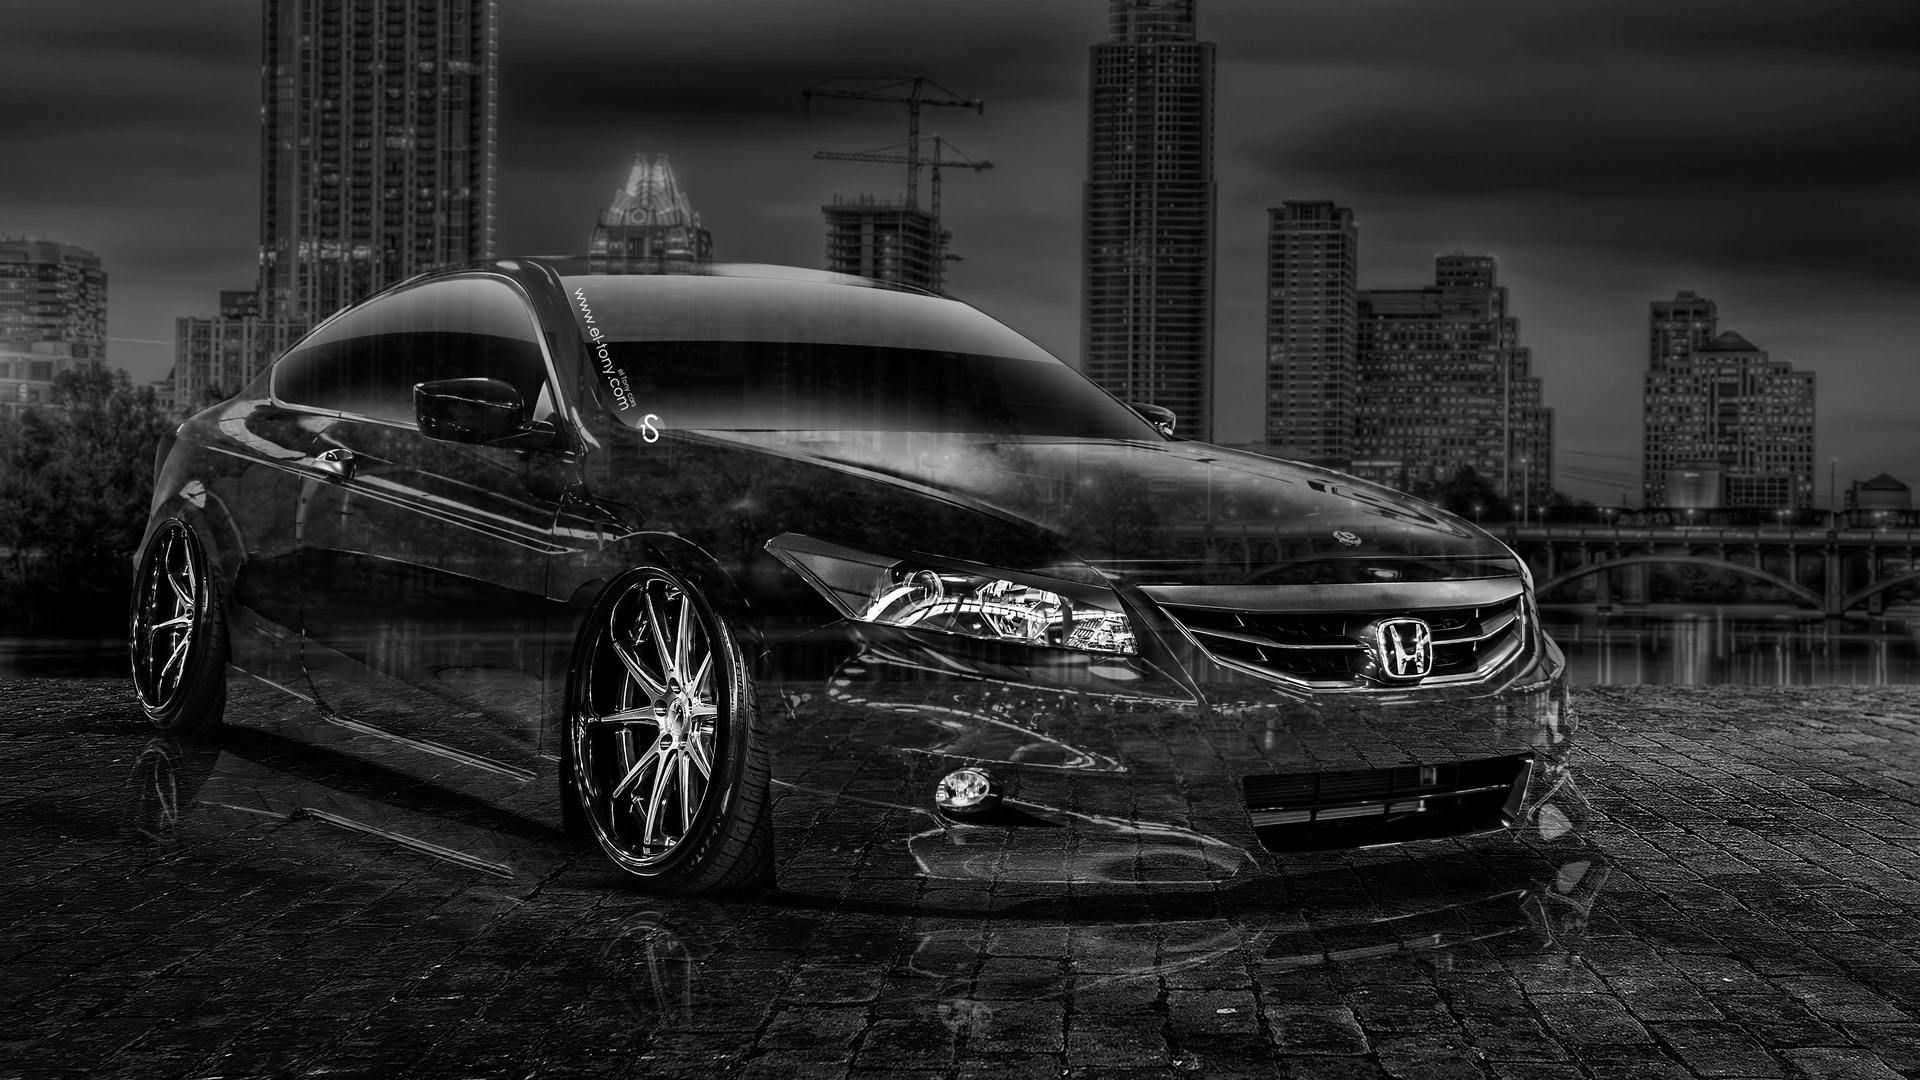 Cool Honda Accord Wallpaper HD